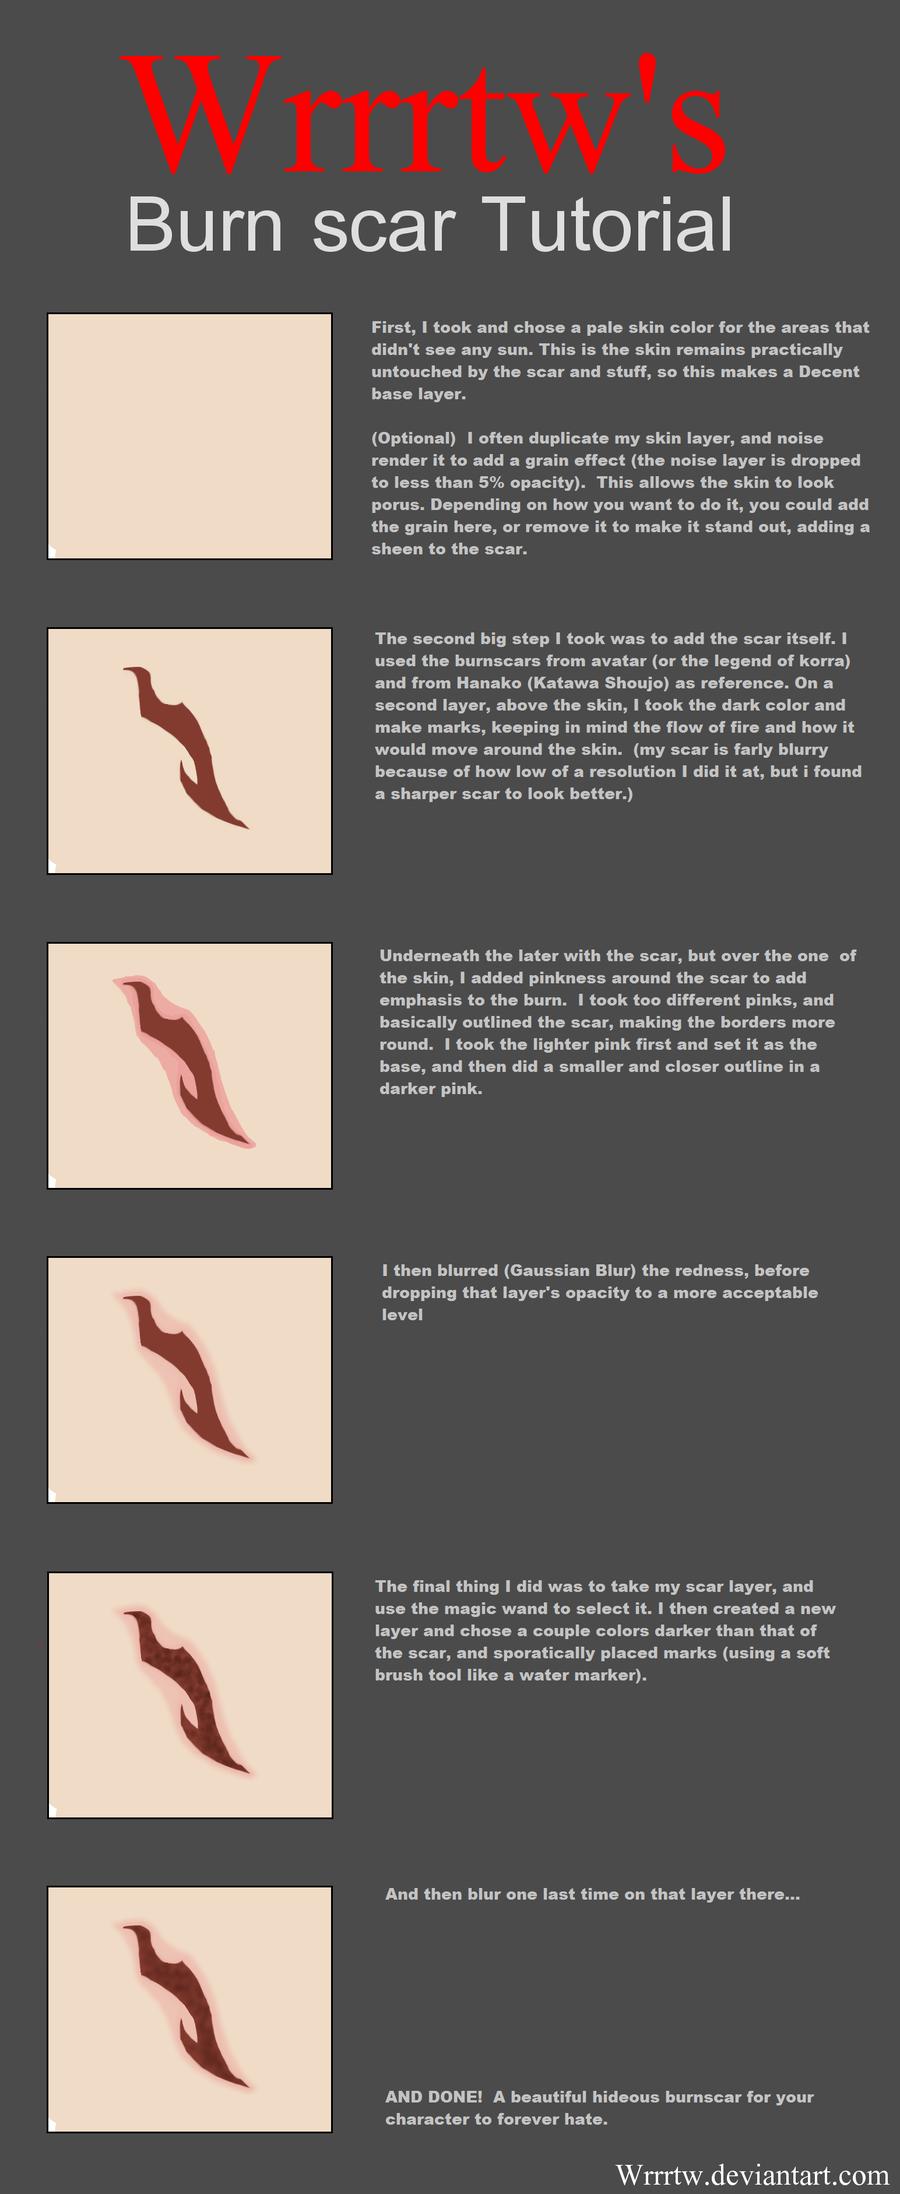 Burn Scar tutorial by wrrrtw  Art and stuff anatomy and